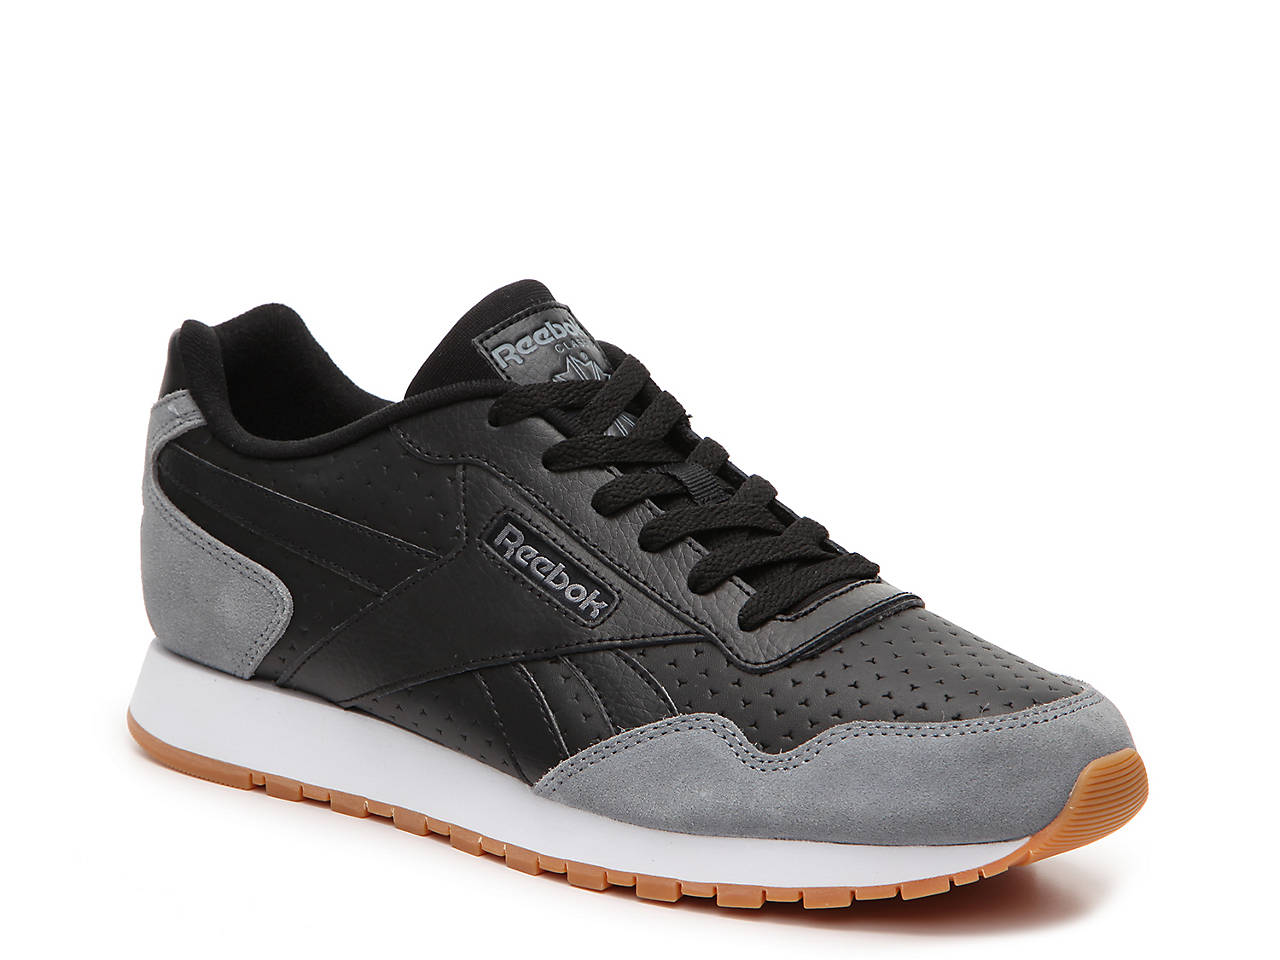 7996a347535 Reebok Harman Sneaker - Men s Men s Shoes